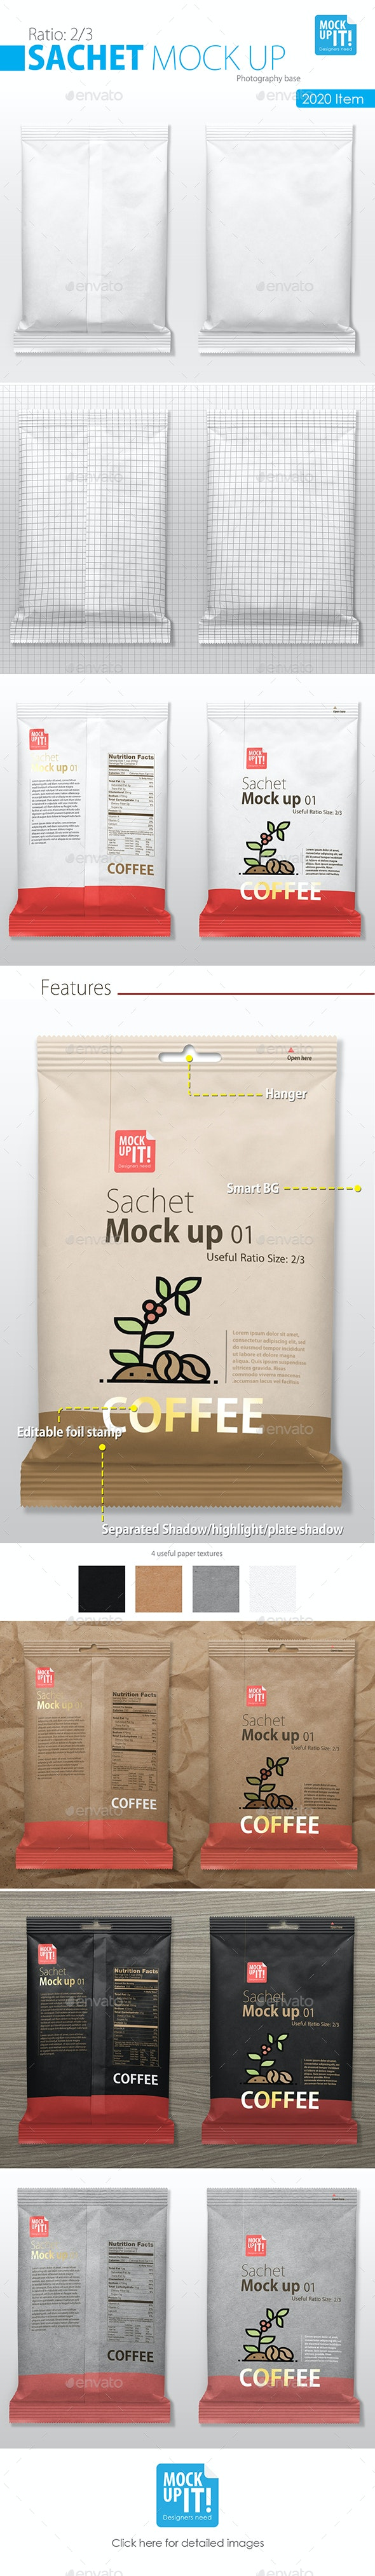 Sachet Mockup - Food and Drink Packaging